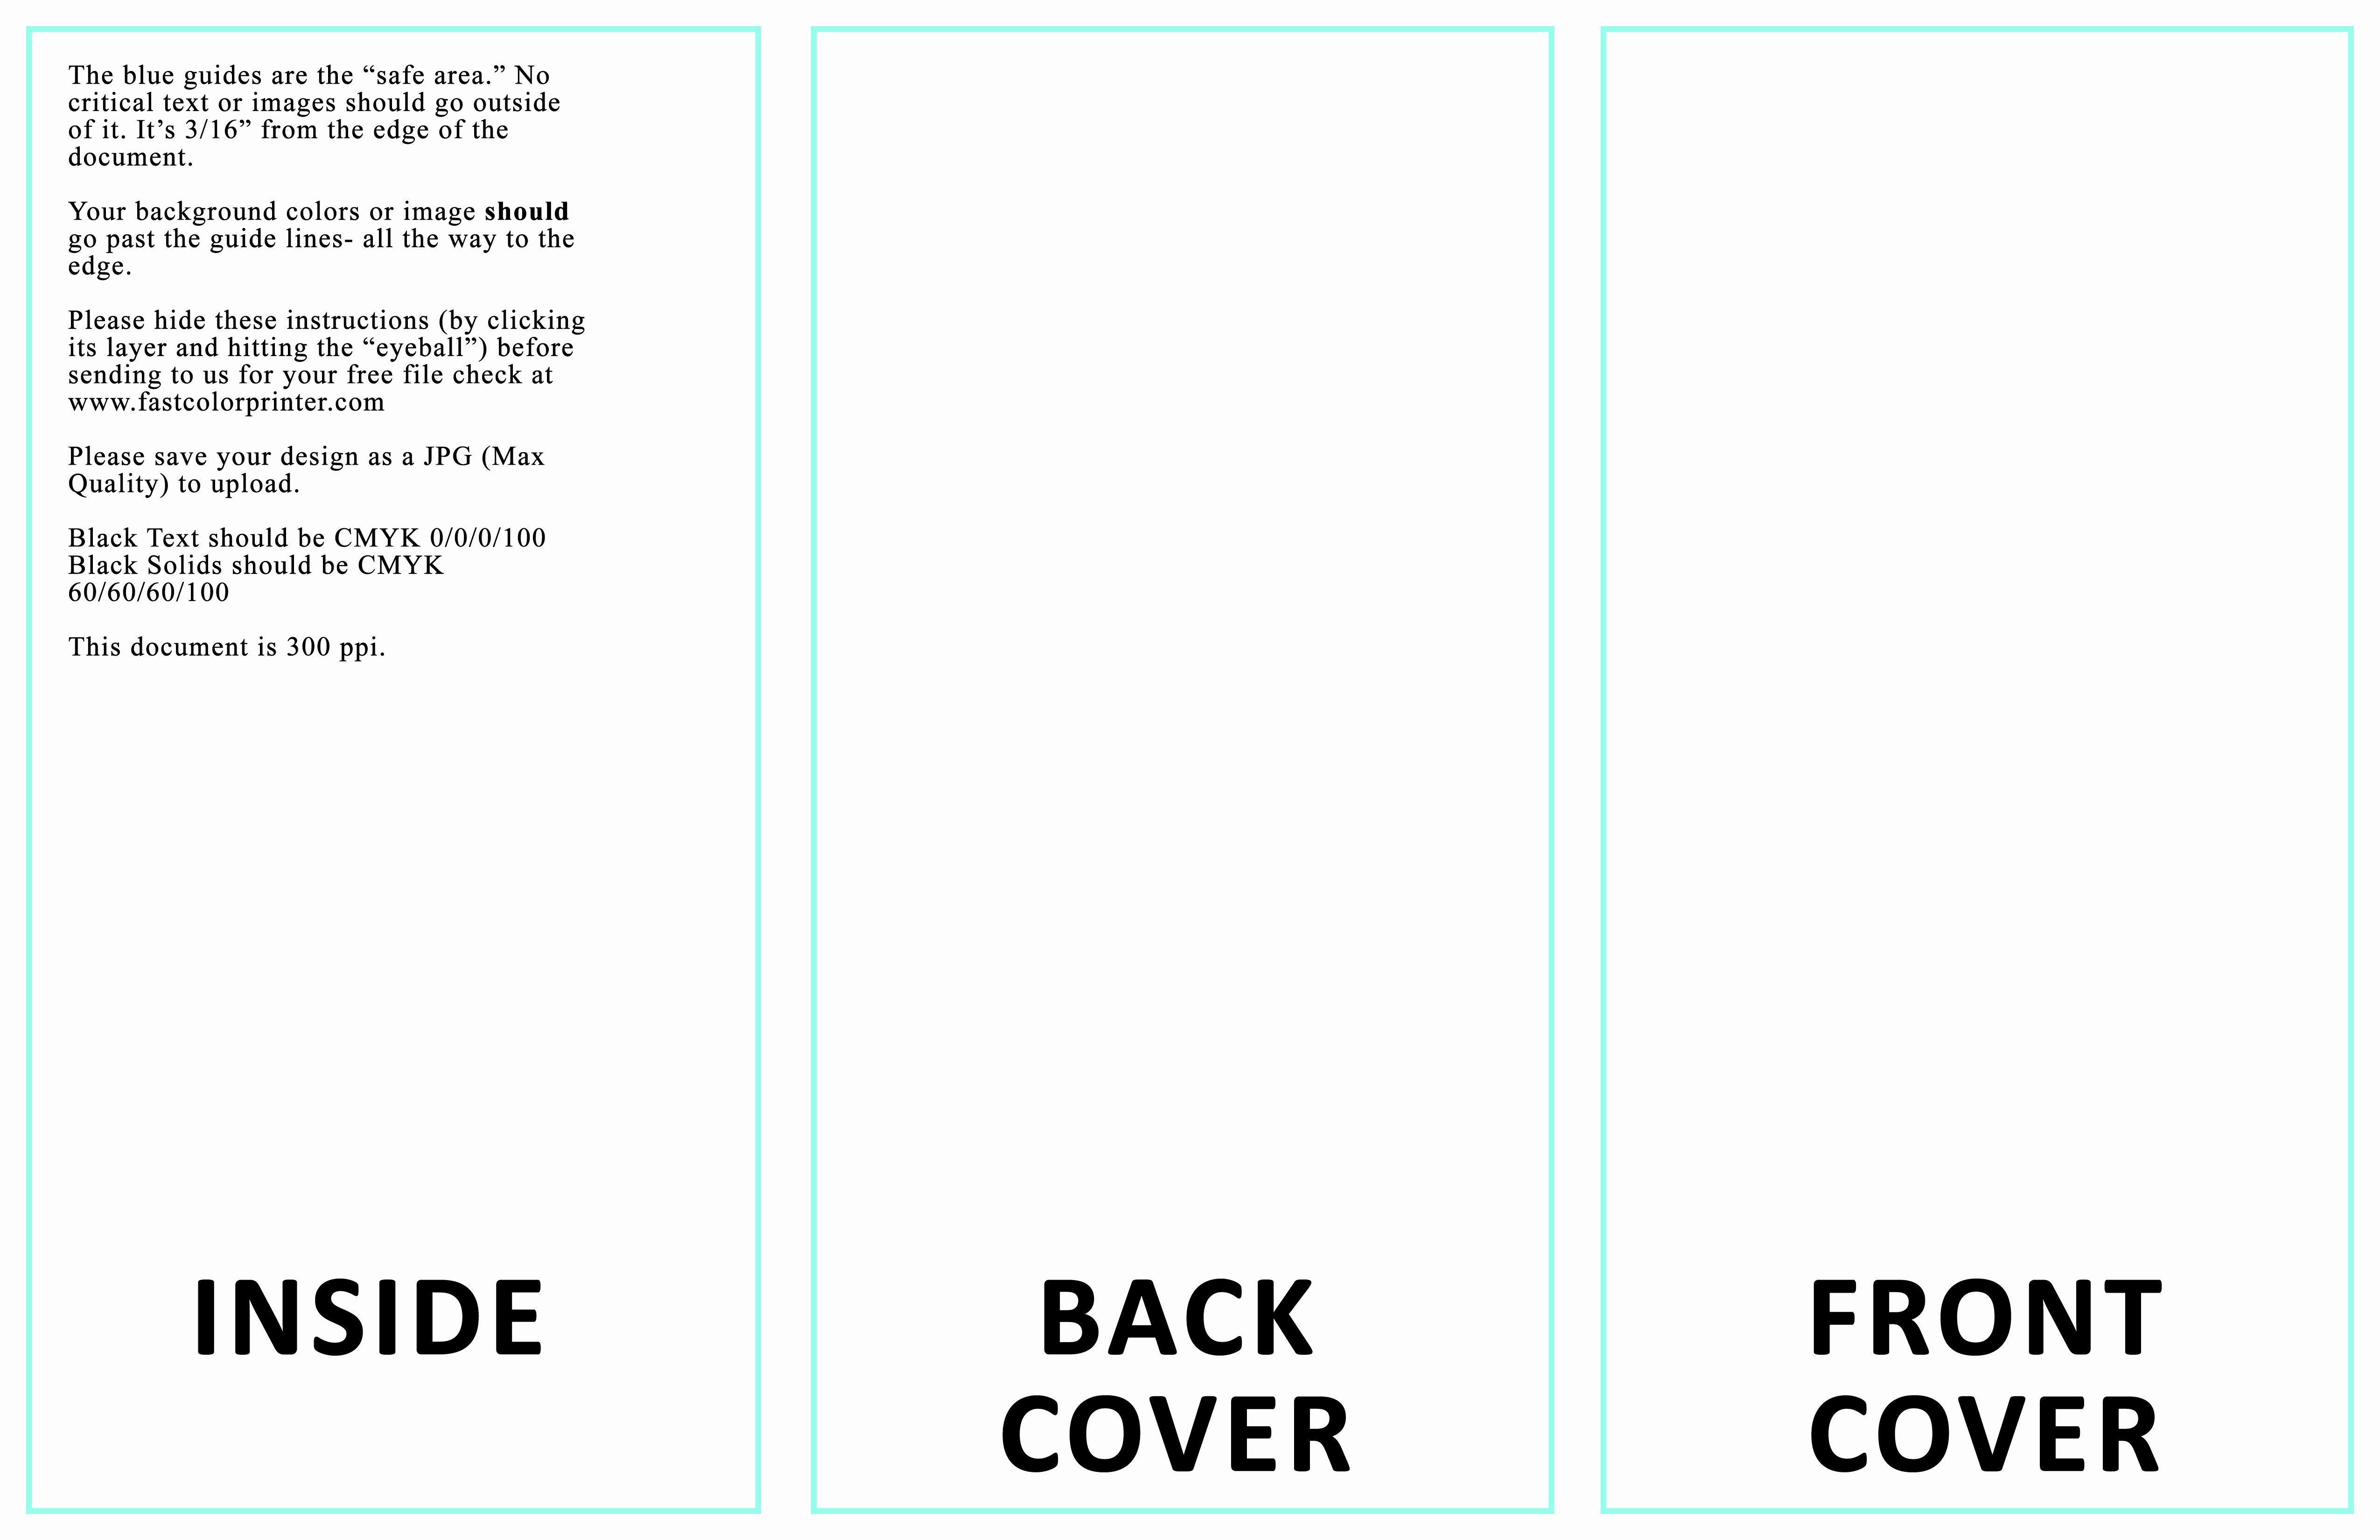 Tri Fold Menu Template Free Inspirational Microsoft Word Tri Fold Template Portablegasgrillwe Pamphlet Template Travel Brochure Template Free Brochure Template - ms word pamphlet template